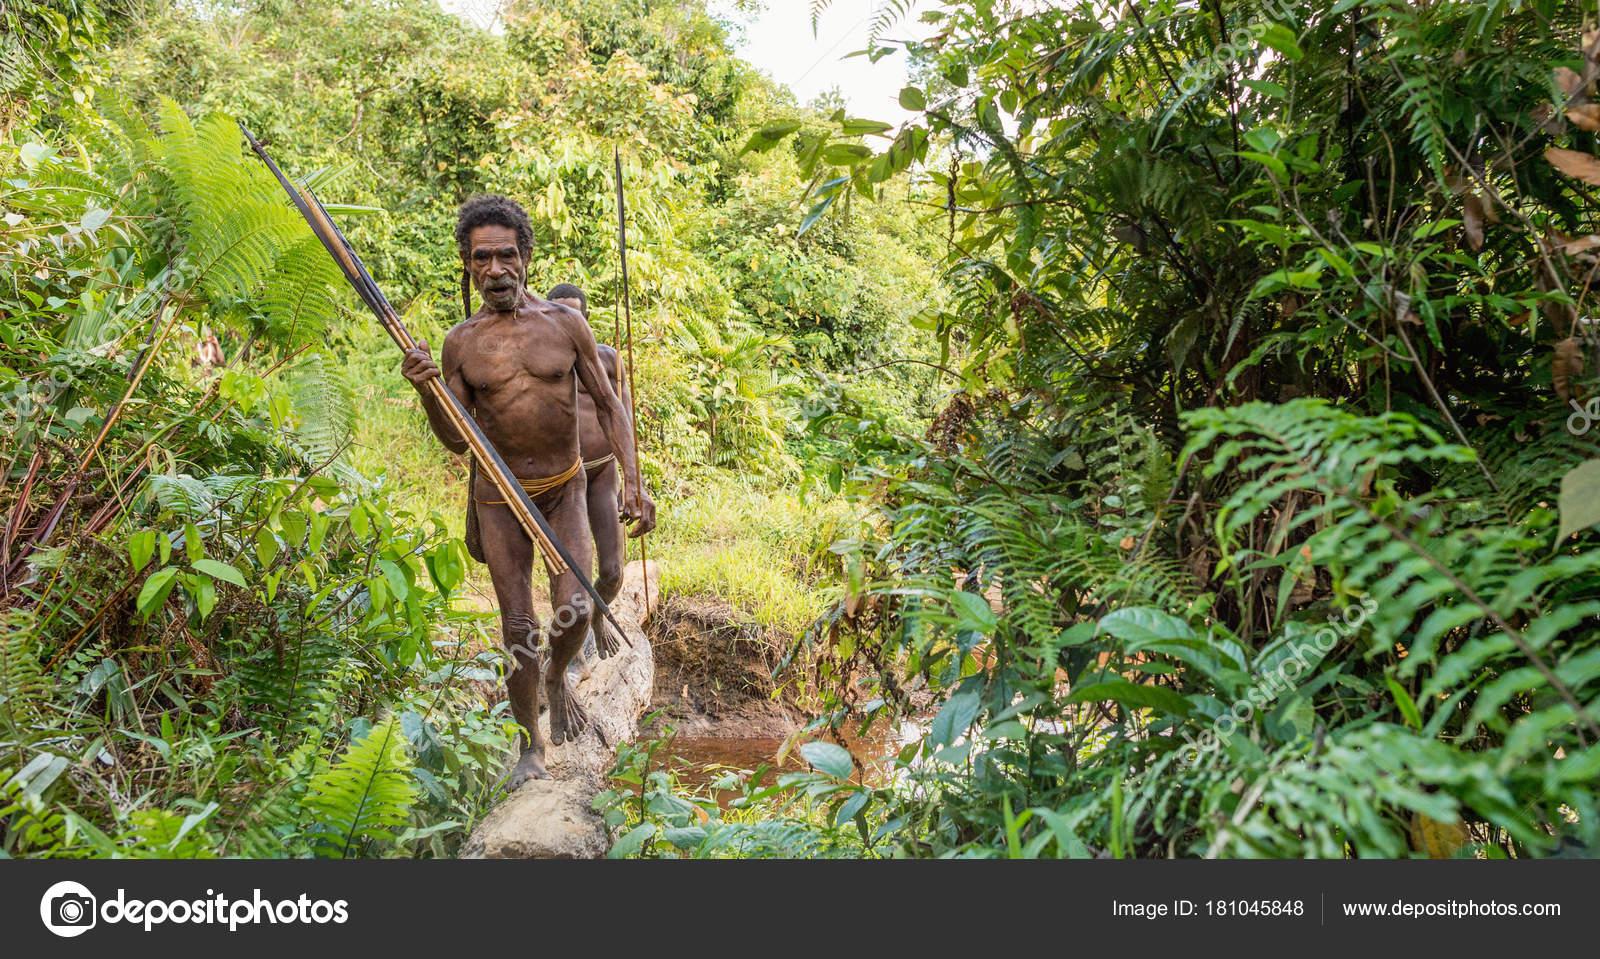 Wild Jungle New Guinea Island Indonesia June Papuans Korowai Kolufo